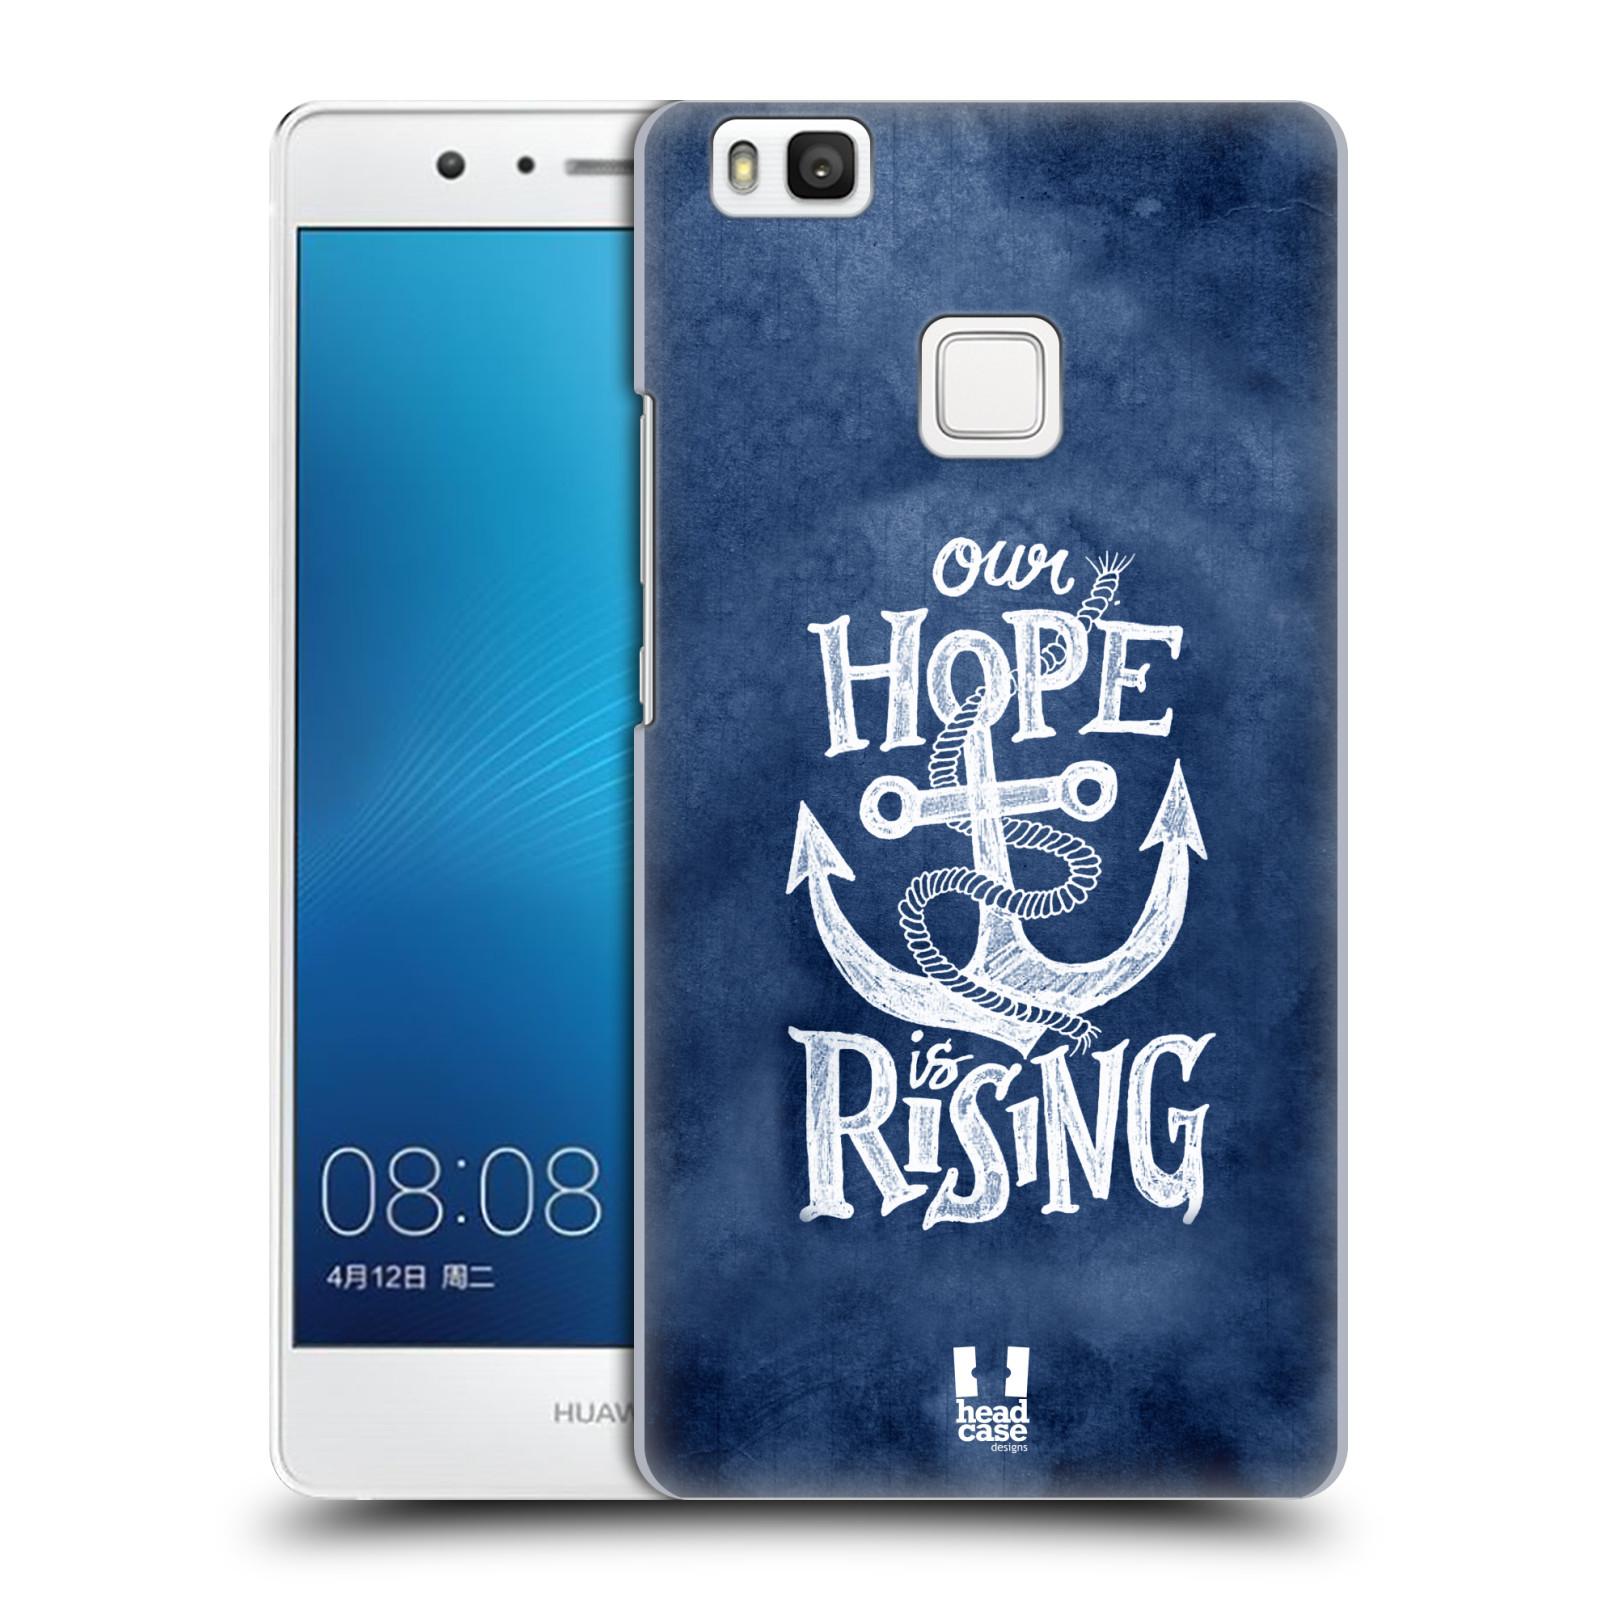 Plastové pouzdro na mobil Huawei P9 Lite HEAD CASE KOTVA RISING